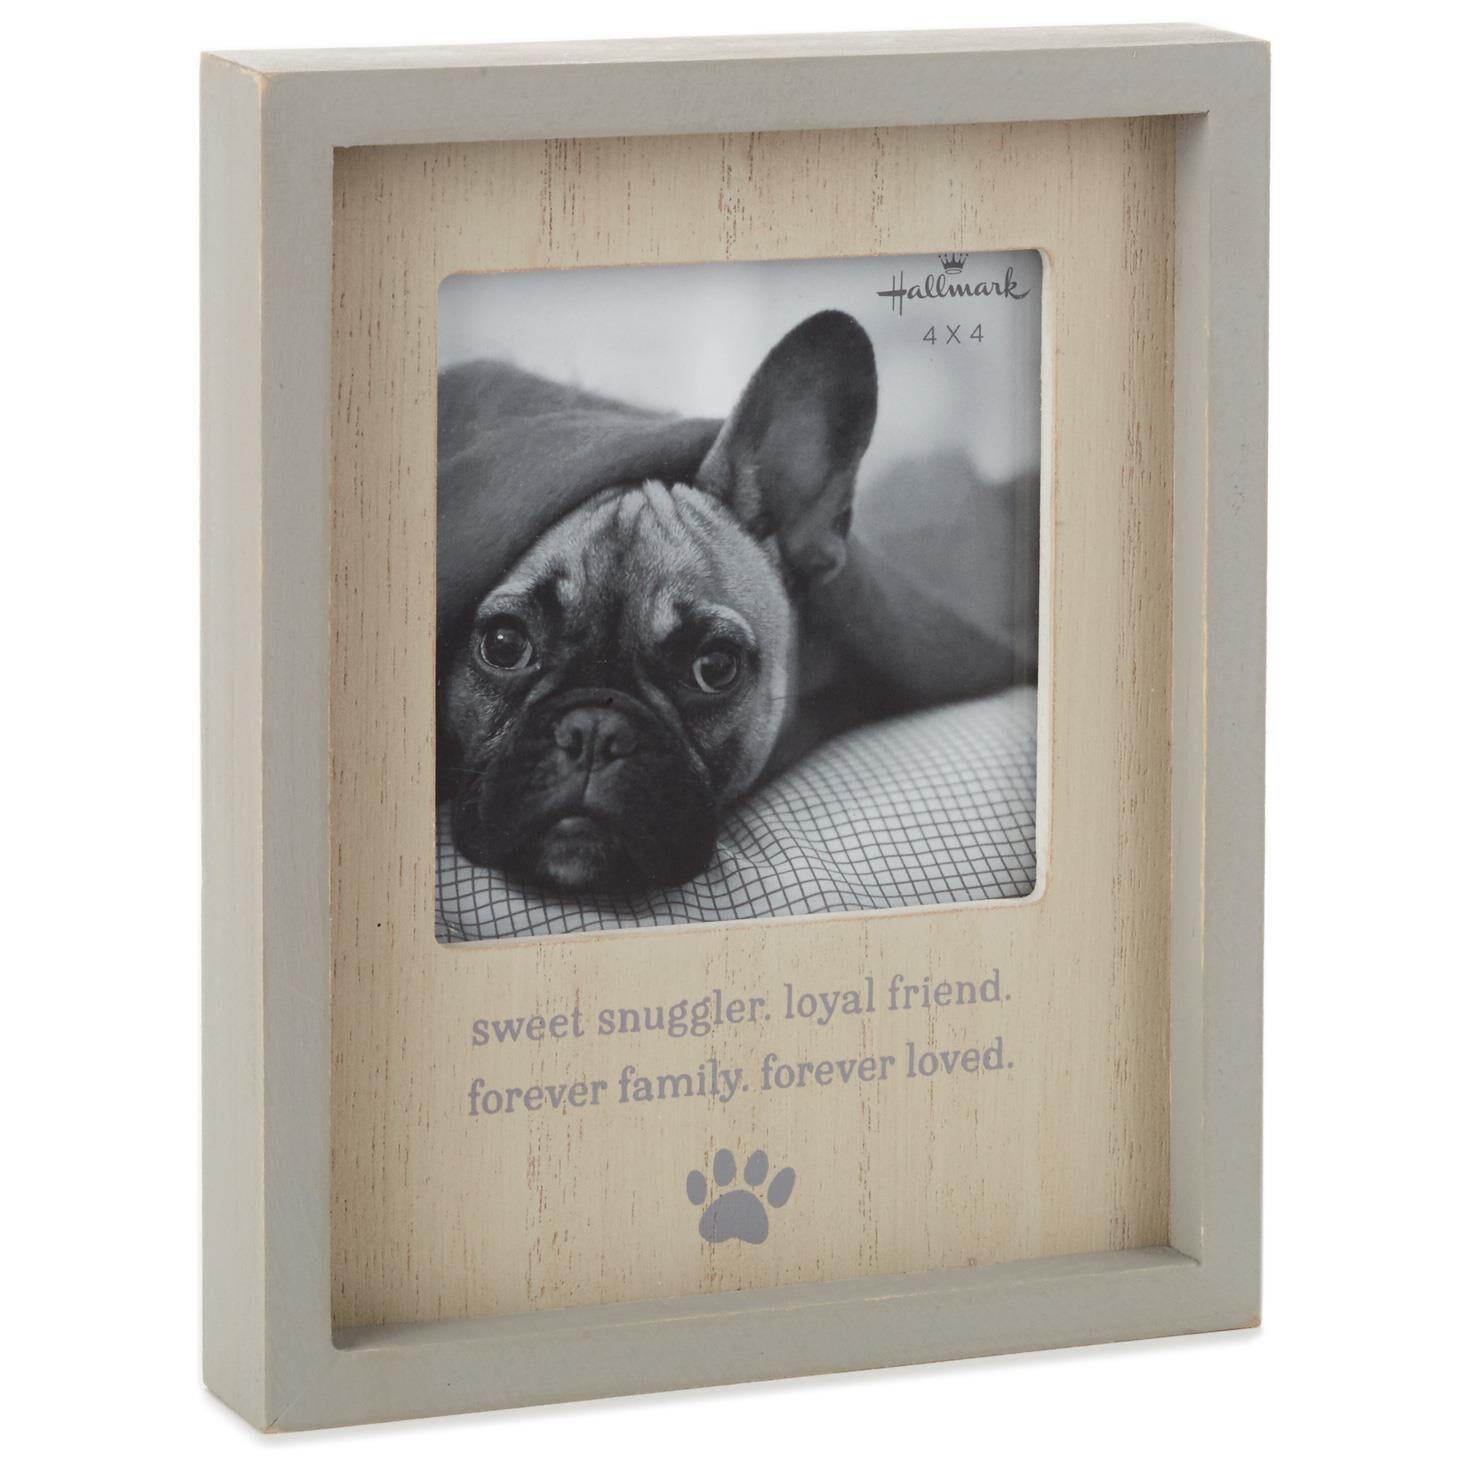 Sweet snuggler pet picture frame 4x4 picture frames hallmark jeuxipadfo Images